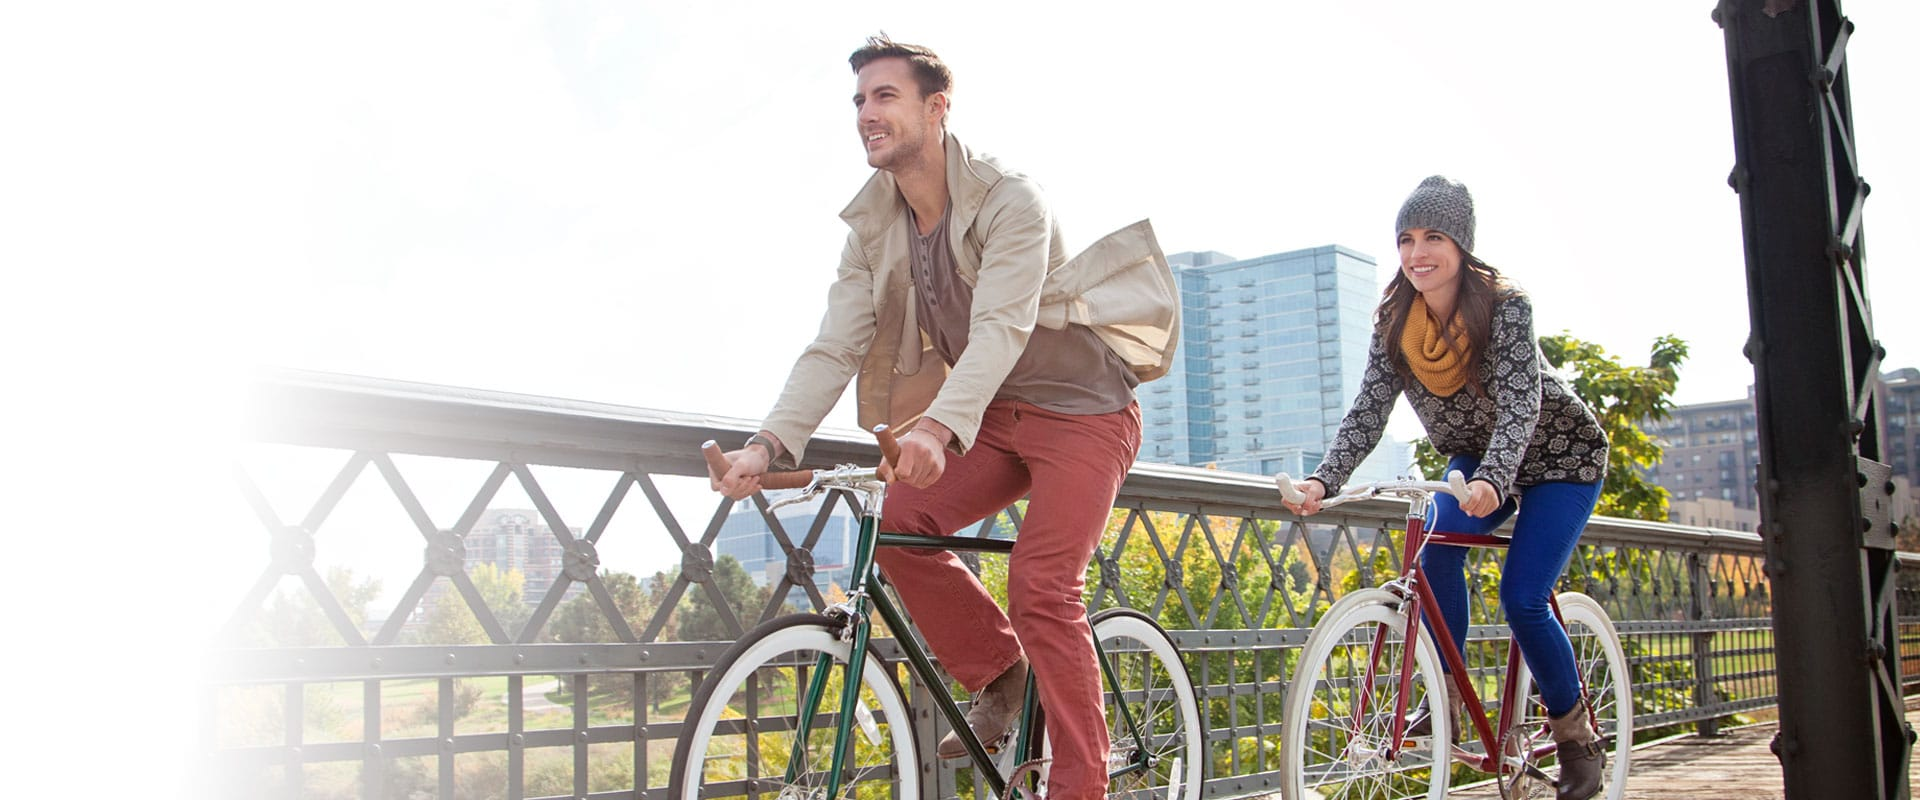 Bike riding at Central Park Orthodontics in Denver, CO